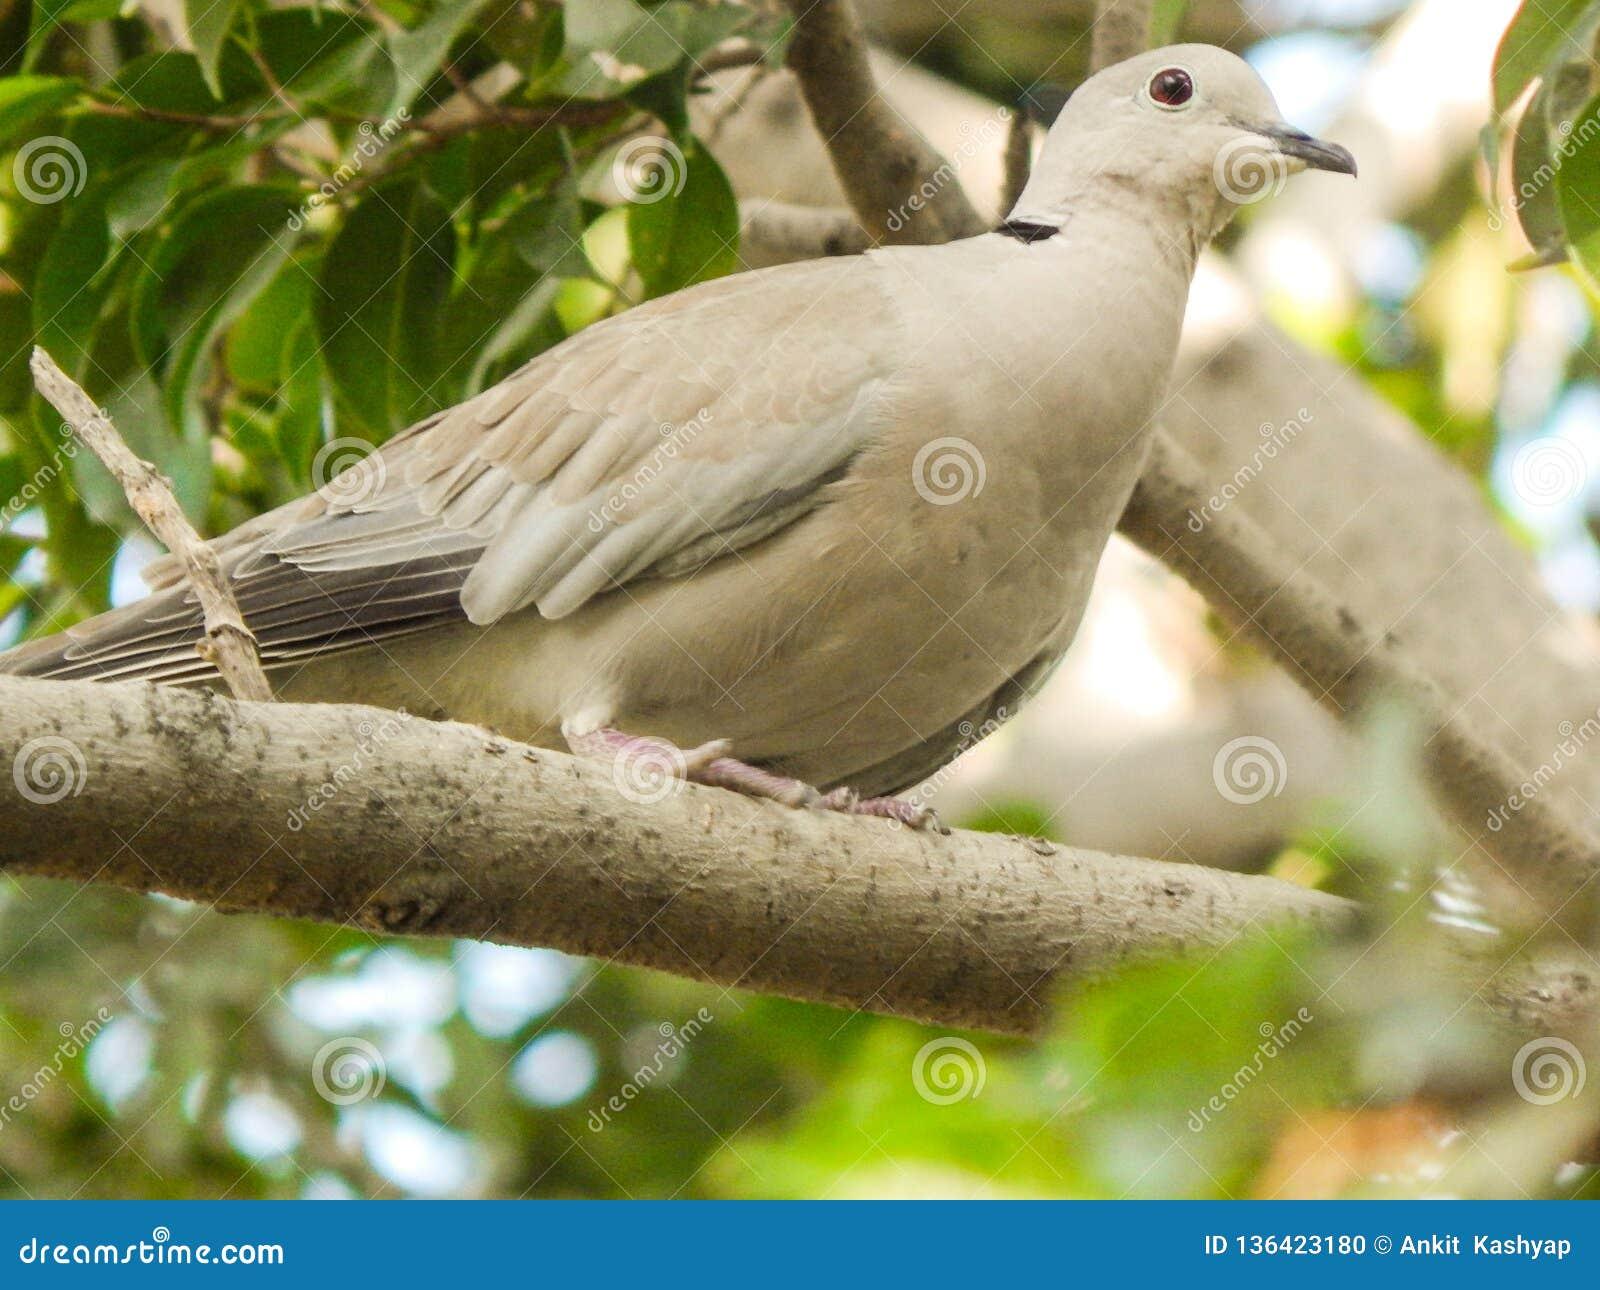 Paloma agarrada eurasiática que se sienta en una rama de un árbol que mira algo silenciosamente Criatura hermosa hecha por dios